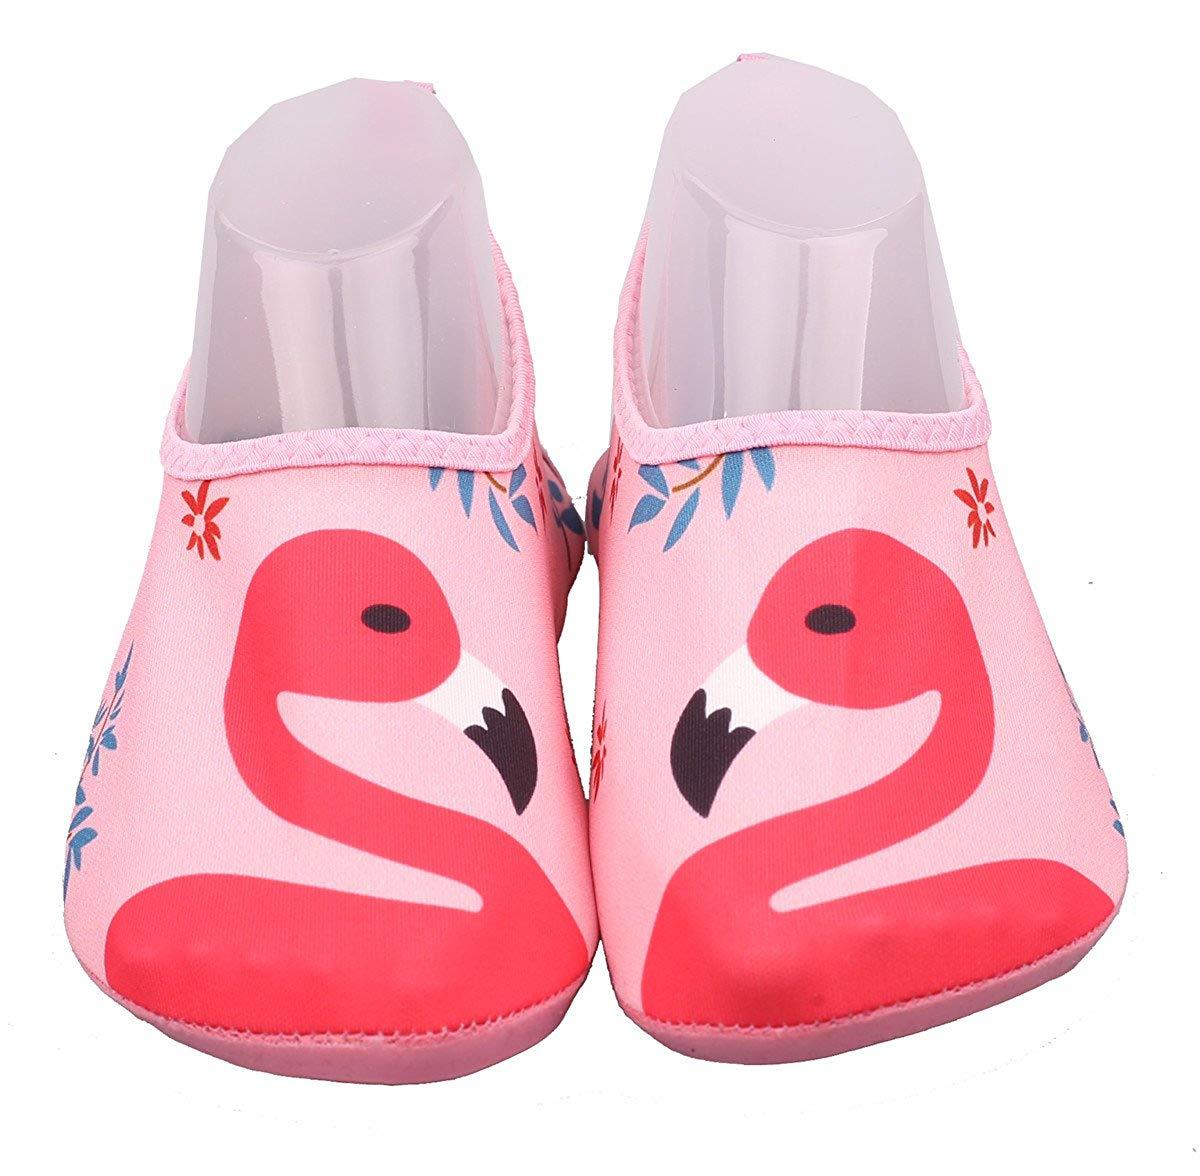 ADAHOP Women's Men's Kids Quick-Dry Water Sports Shoes Barefoot Aqua Yoga Socks